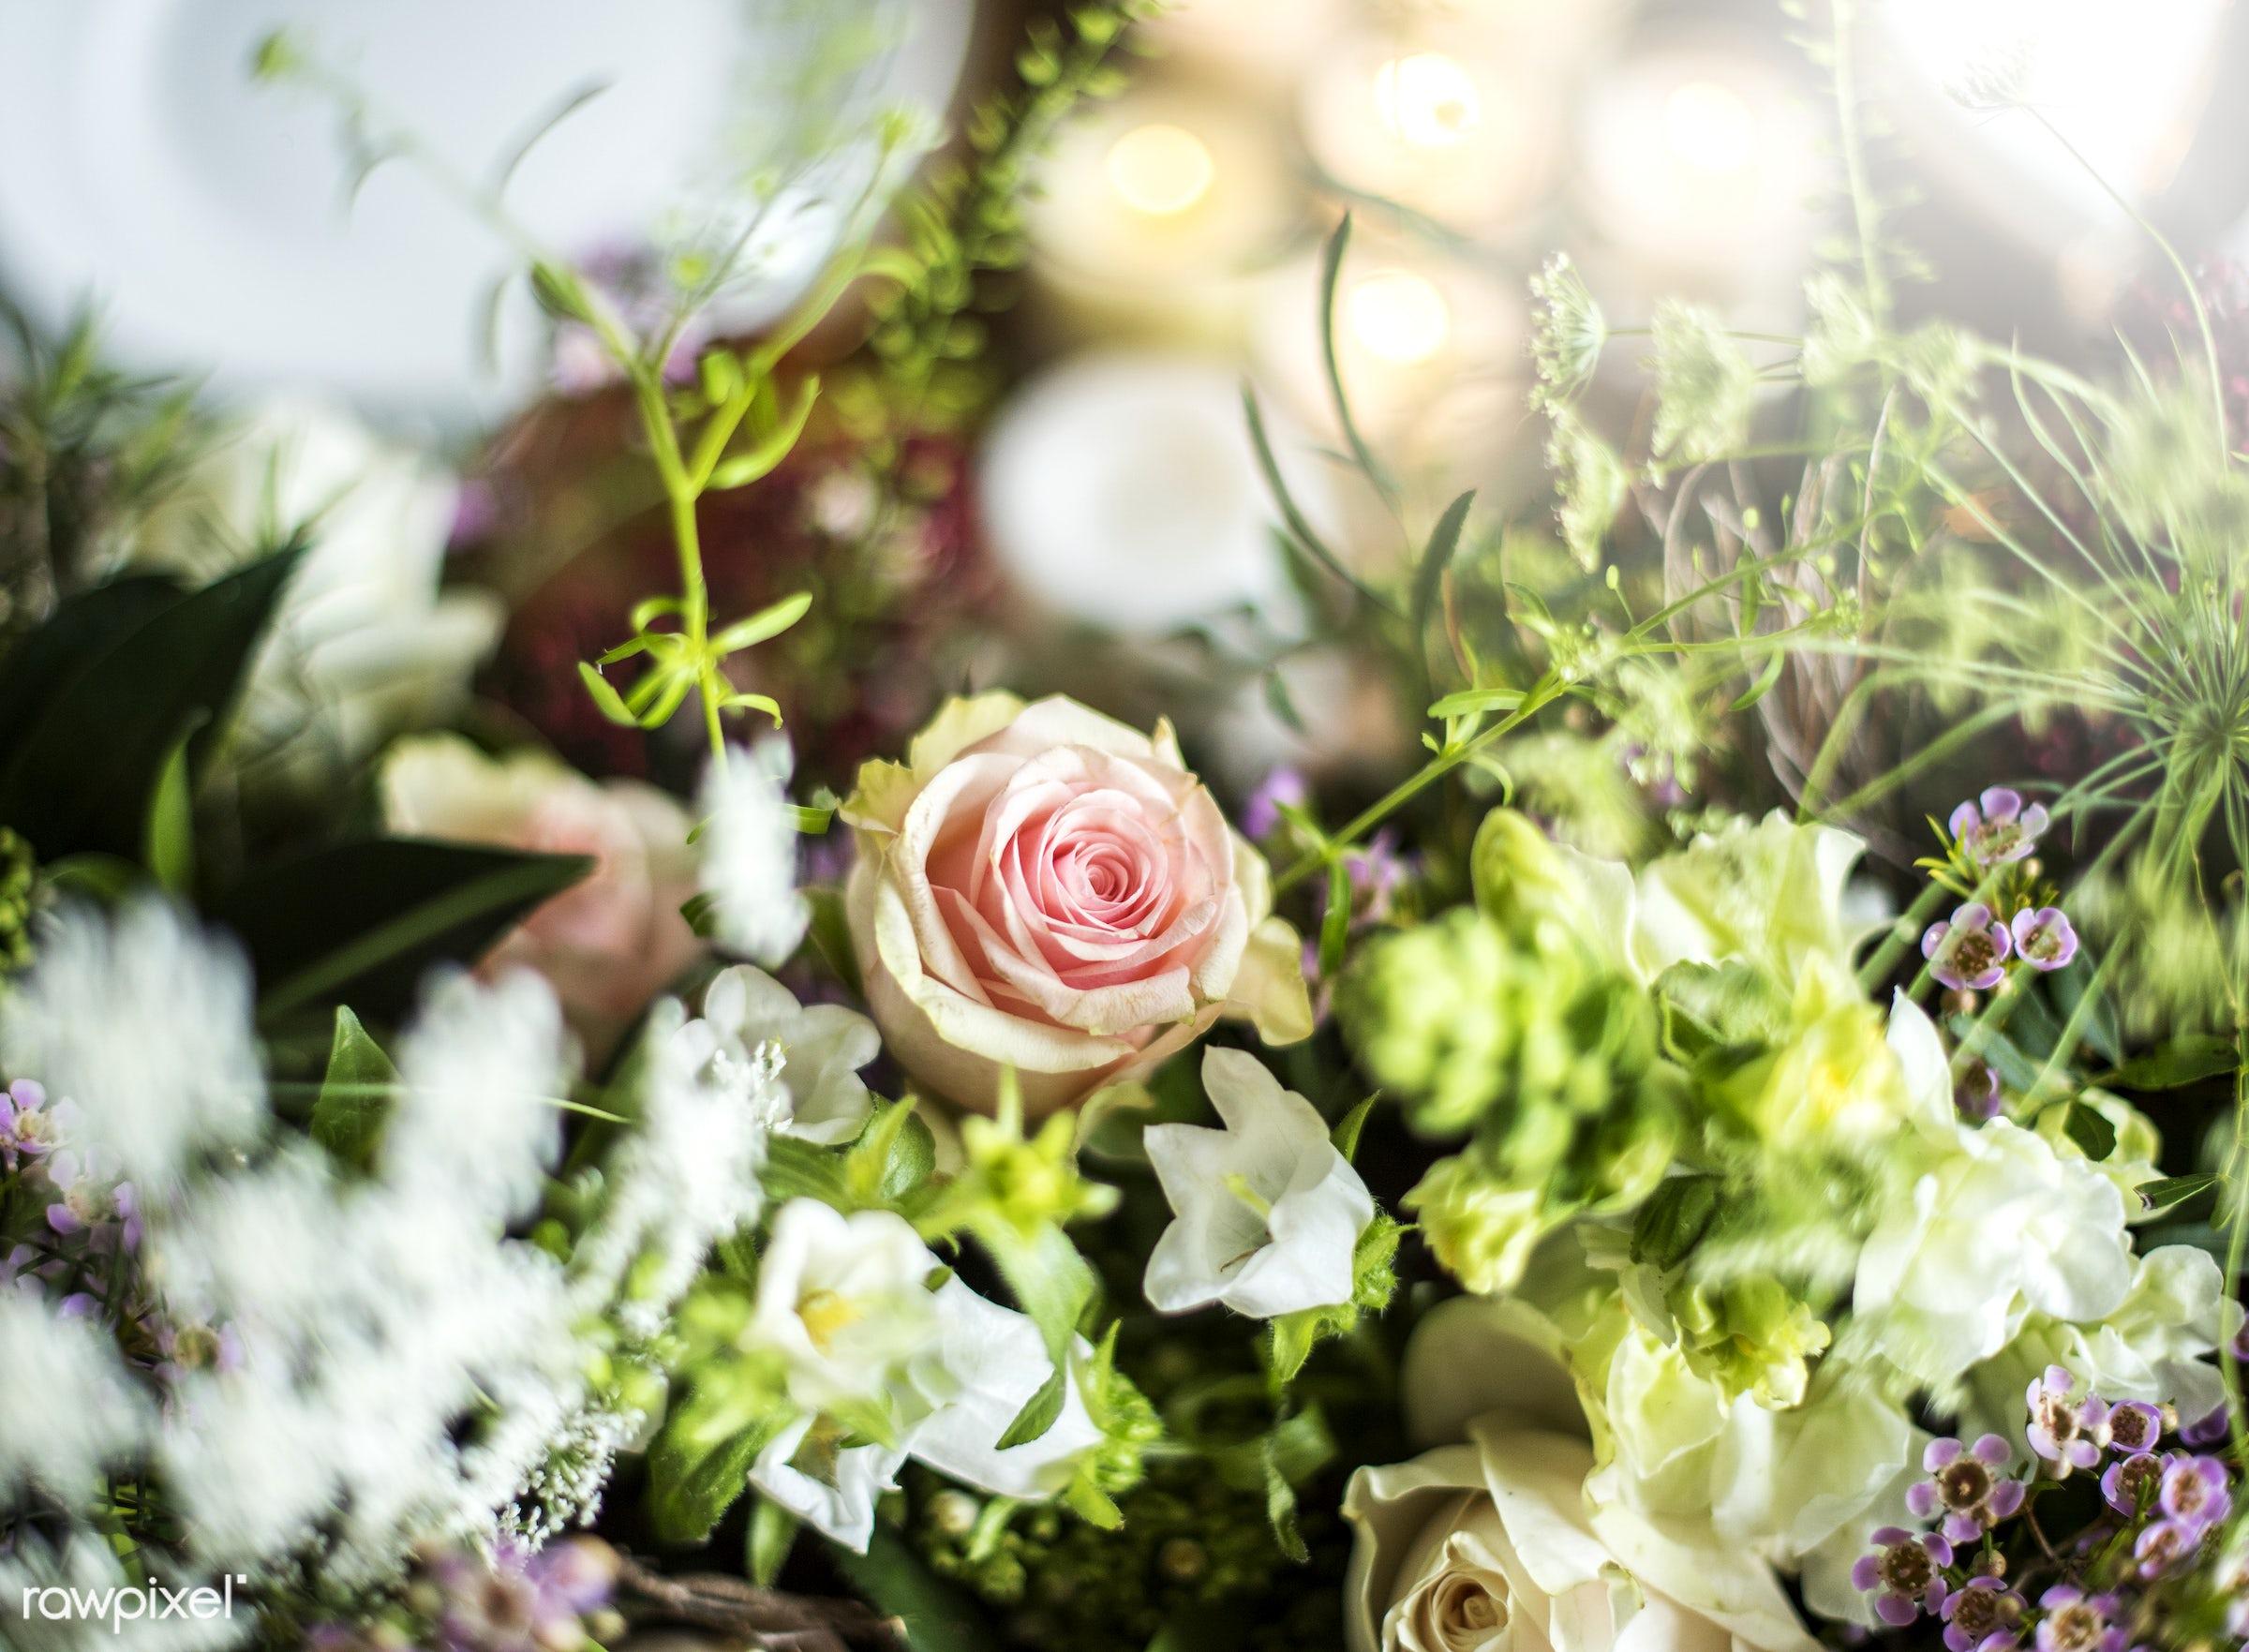 shop, nobody, festive, detail, decorative, colorful, events, plants, spring, blossom, decor, nature, fresh, attractive,...